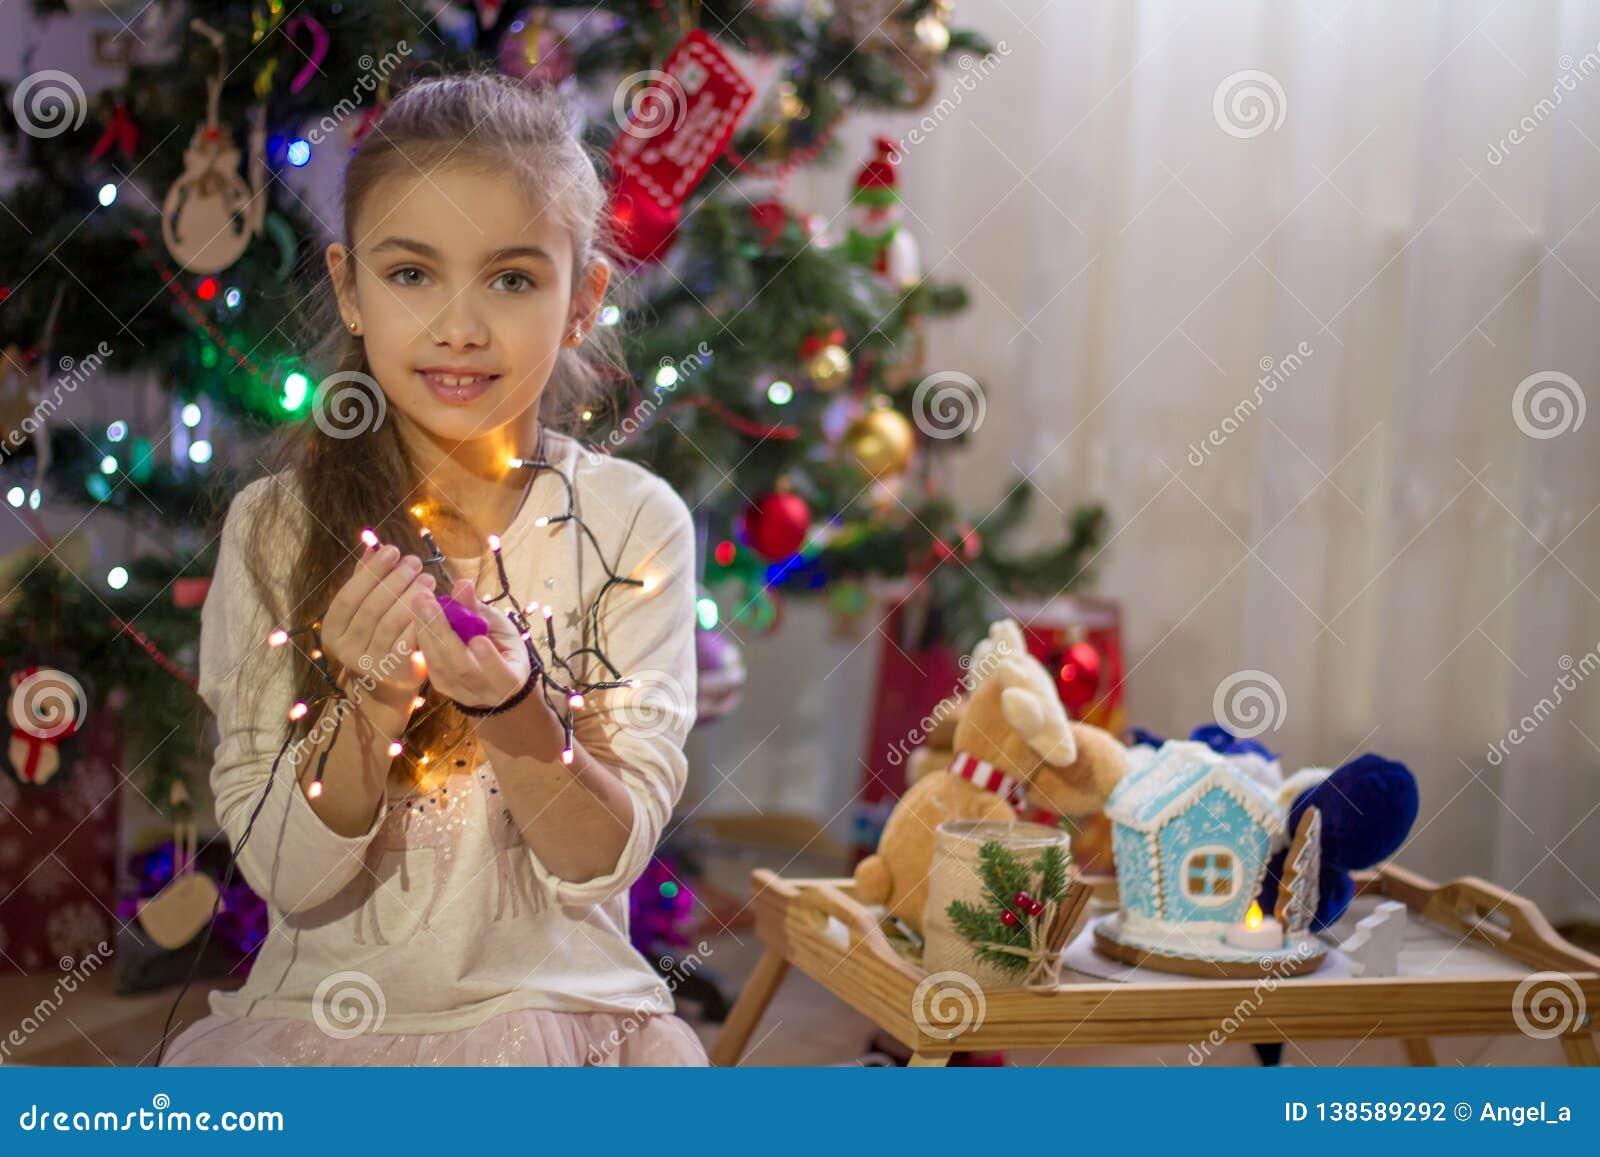 Girl holding lights over Christmas decoration